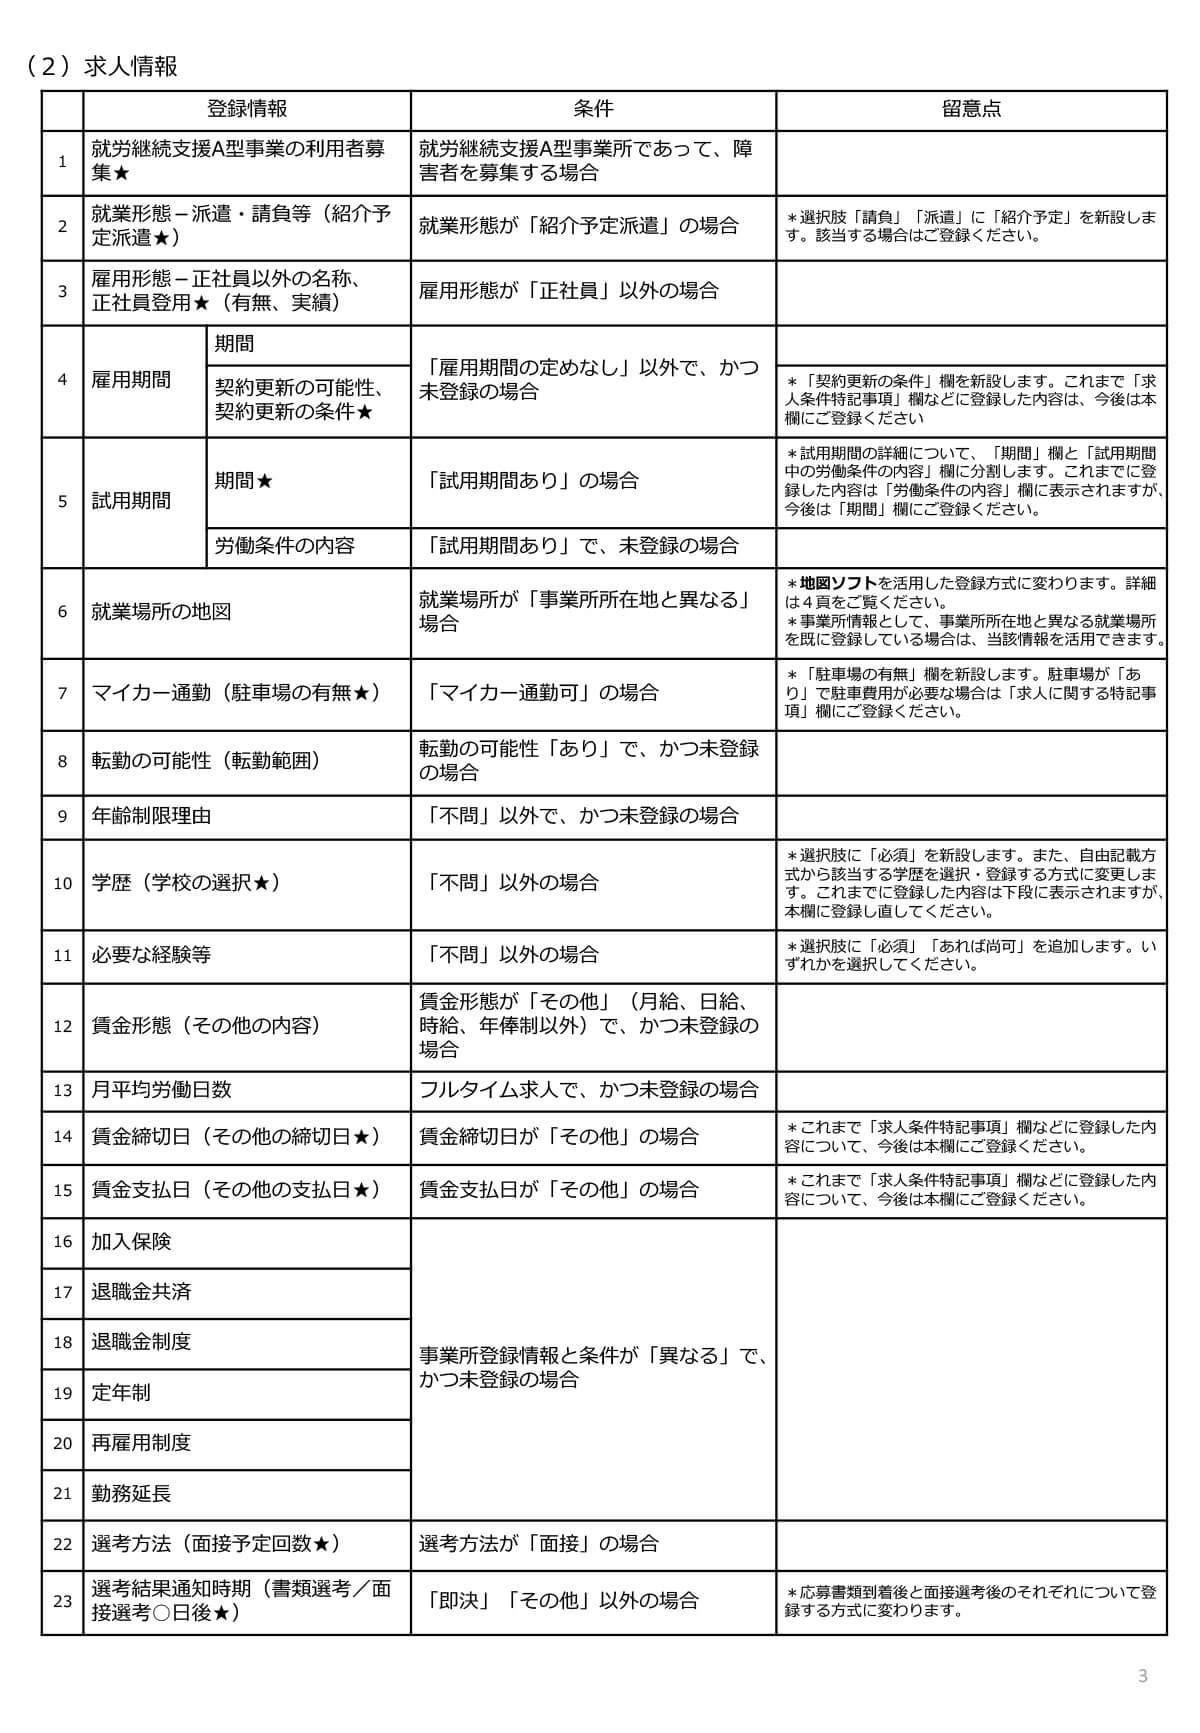 20200106-5-job_posting-2-3